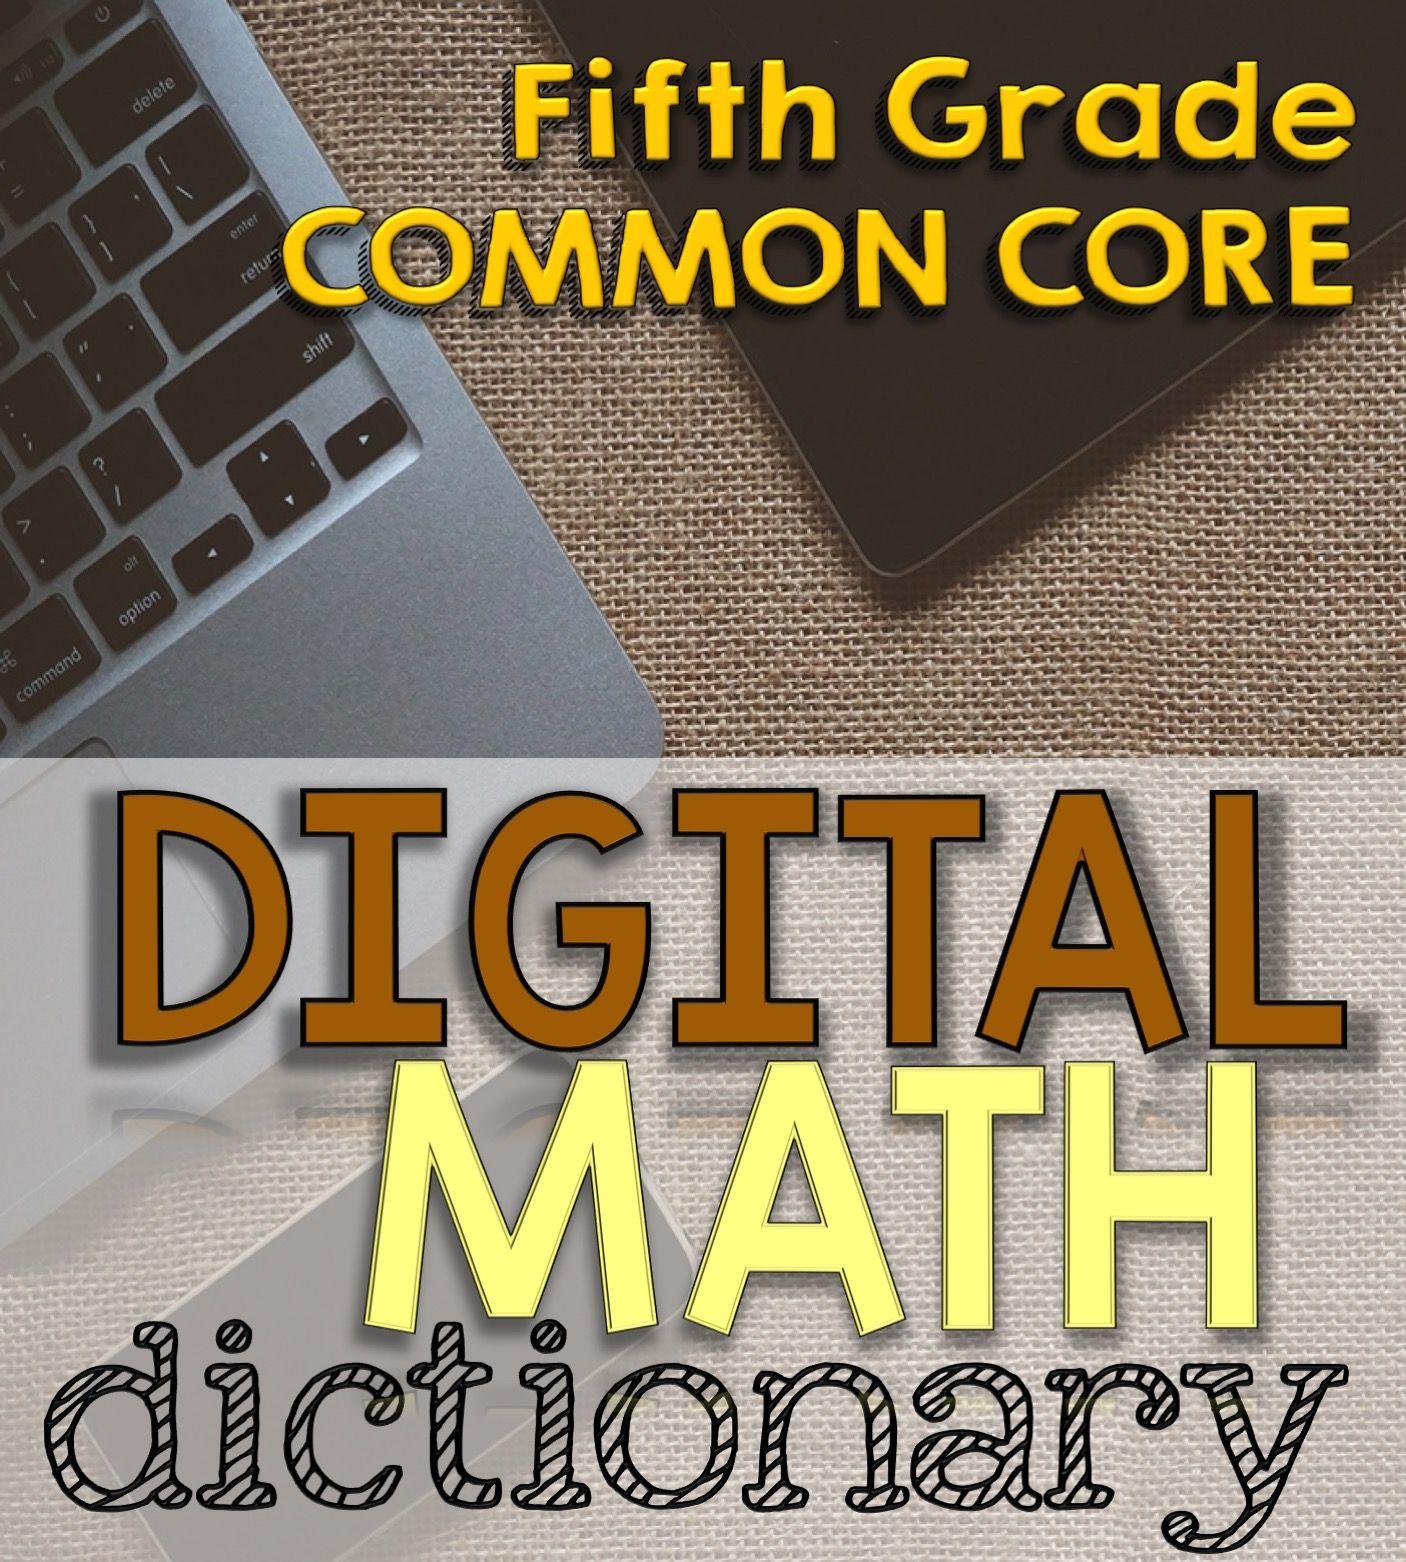 5th Grade Digital Math Dictionary For Common Core Math Vocabulary